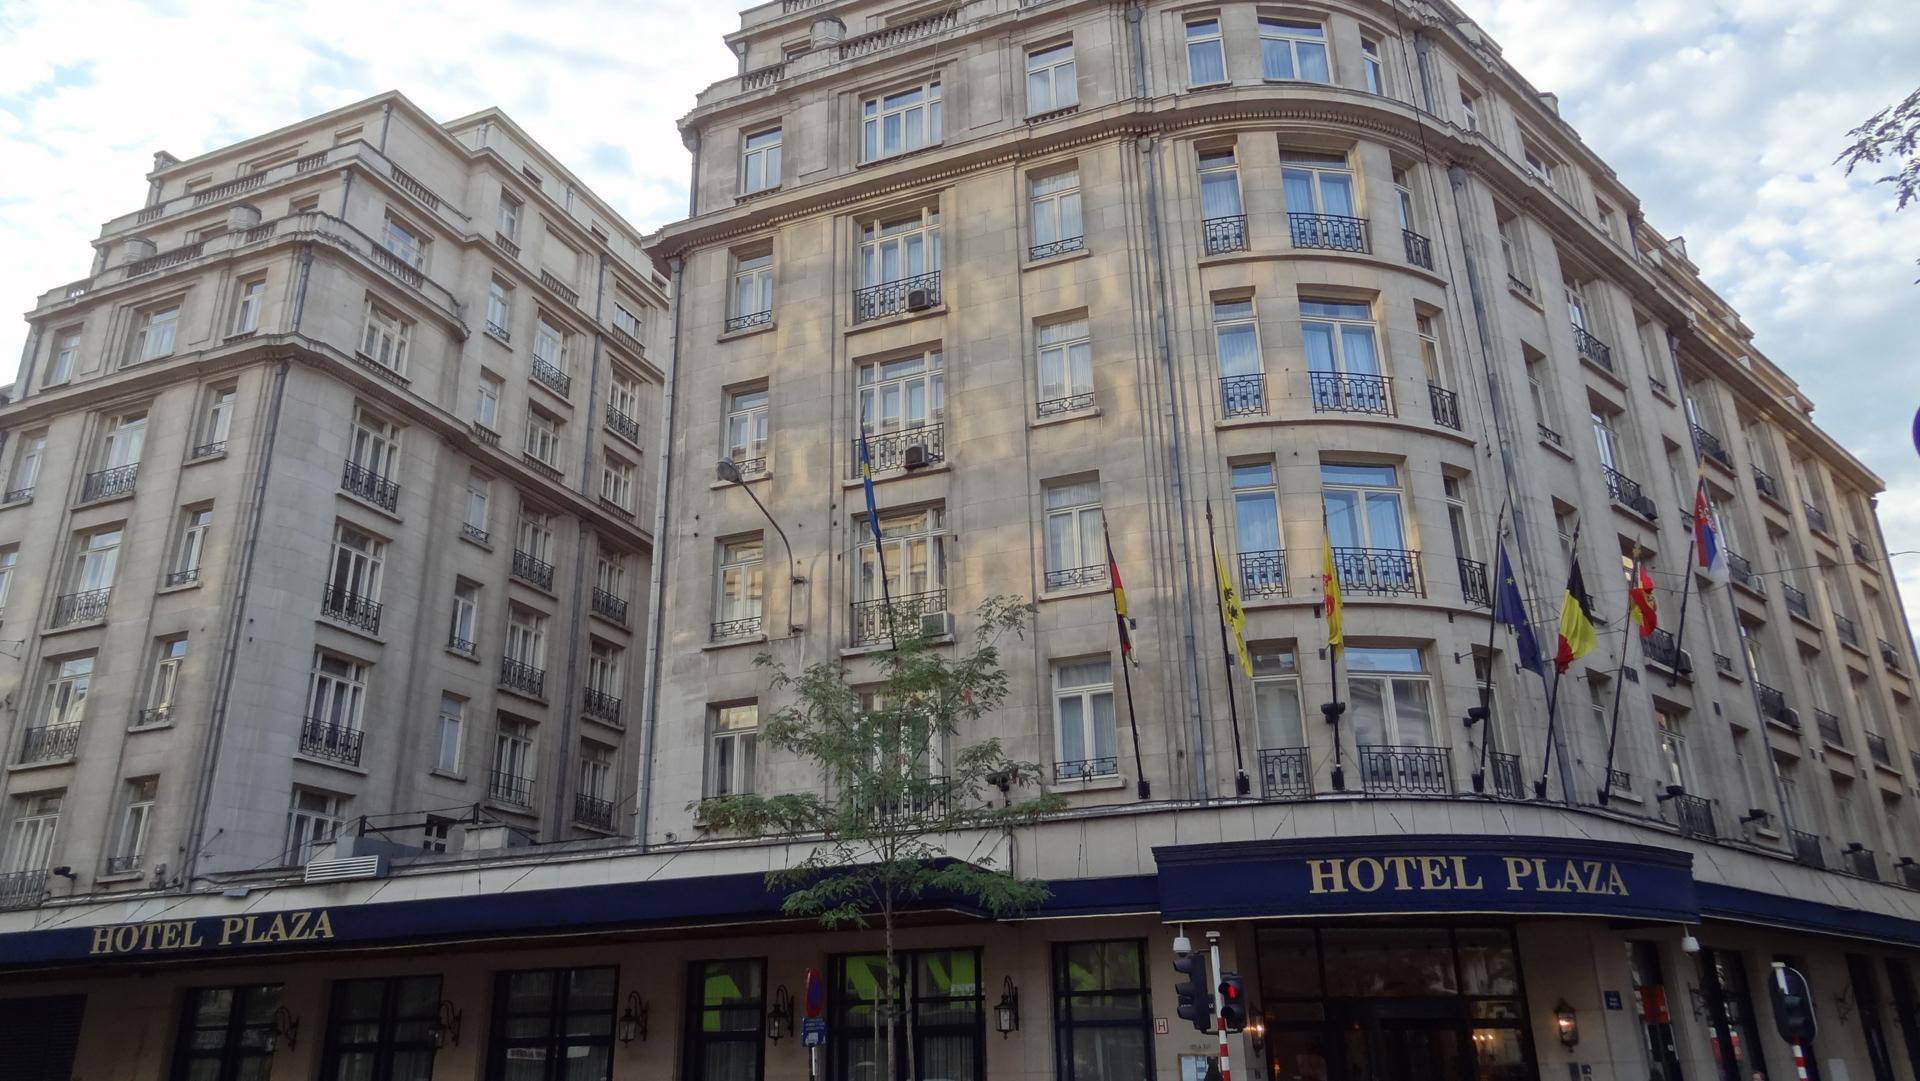 Hotel Plaza Bruxelles - Indépendance Cha Cha